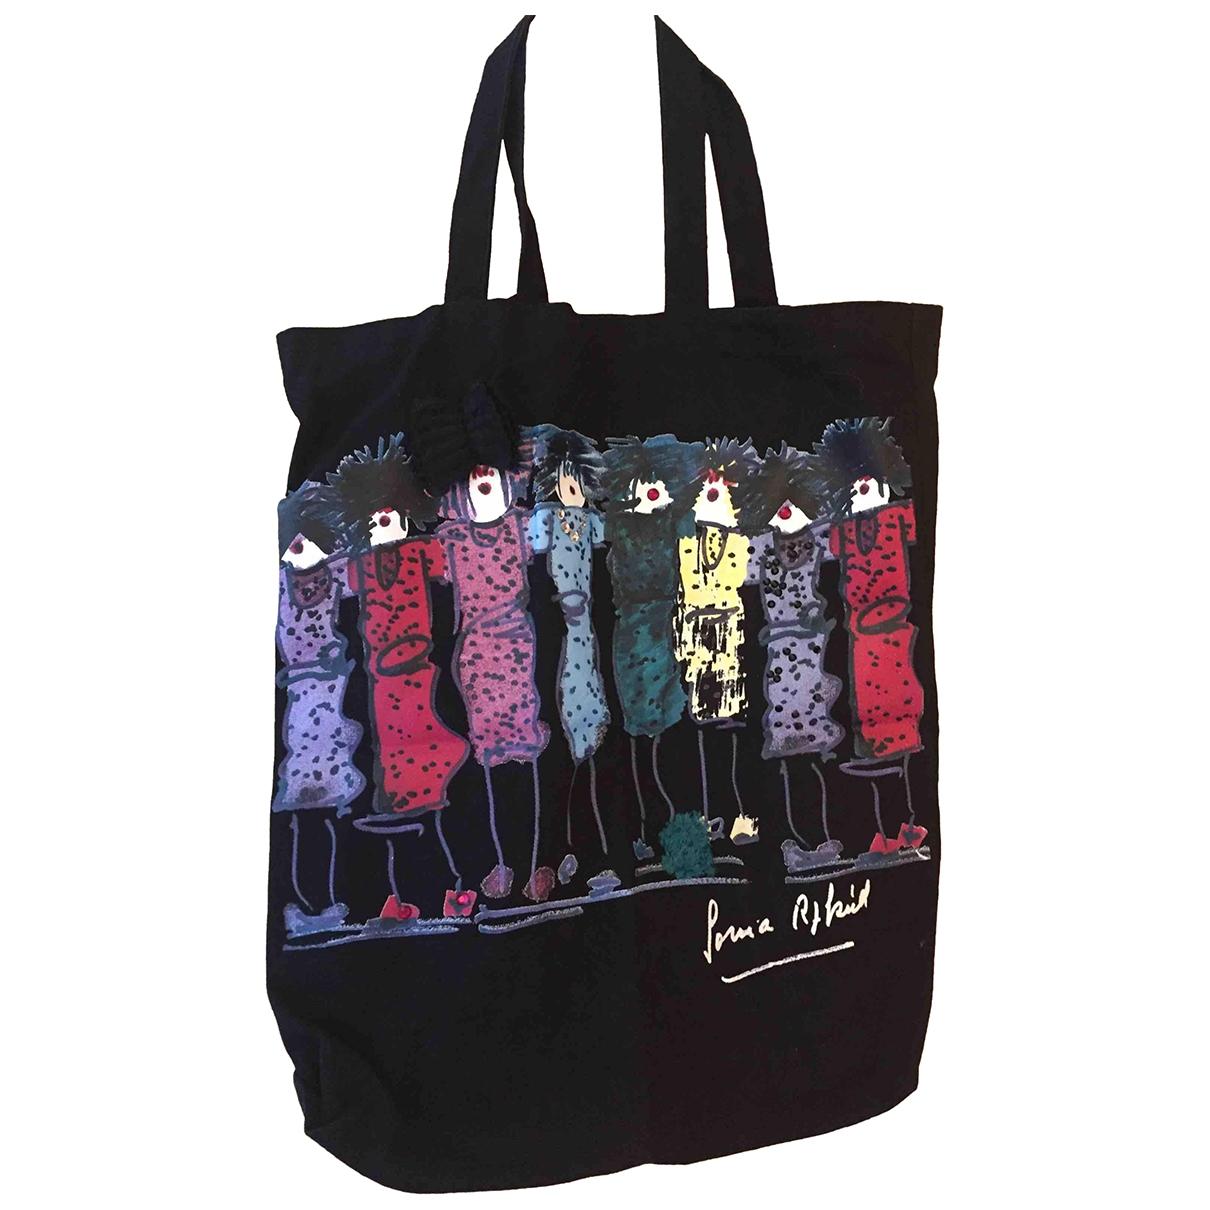 Sonia Rykiel \N Black Cotton handbag for Women \N